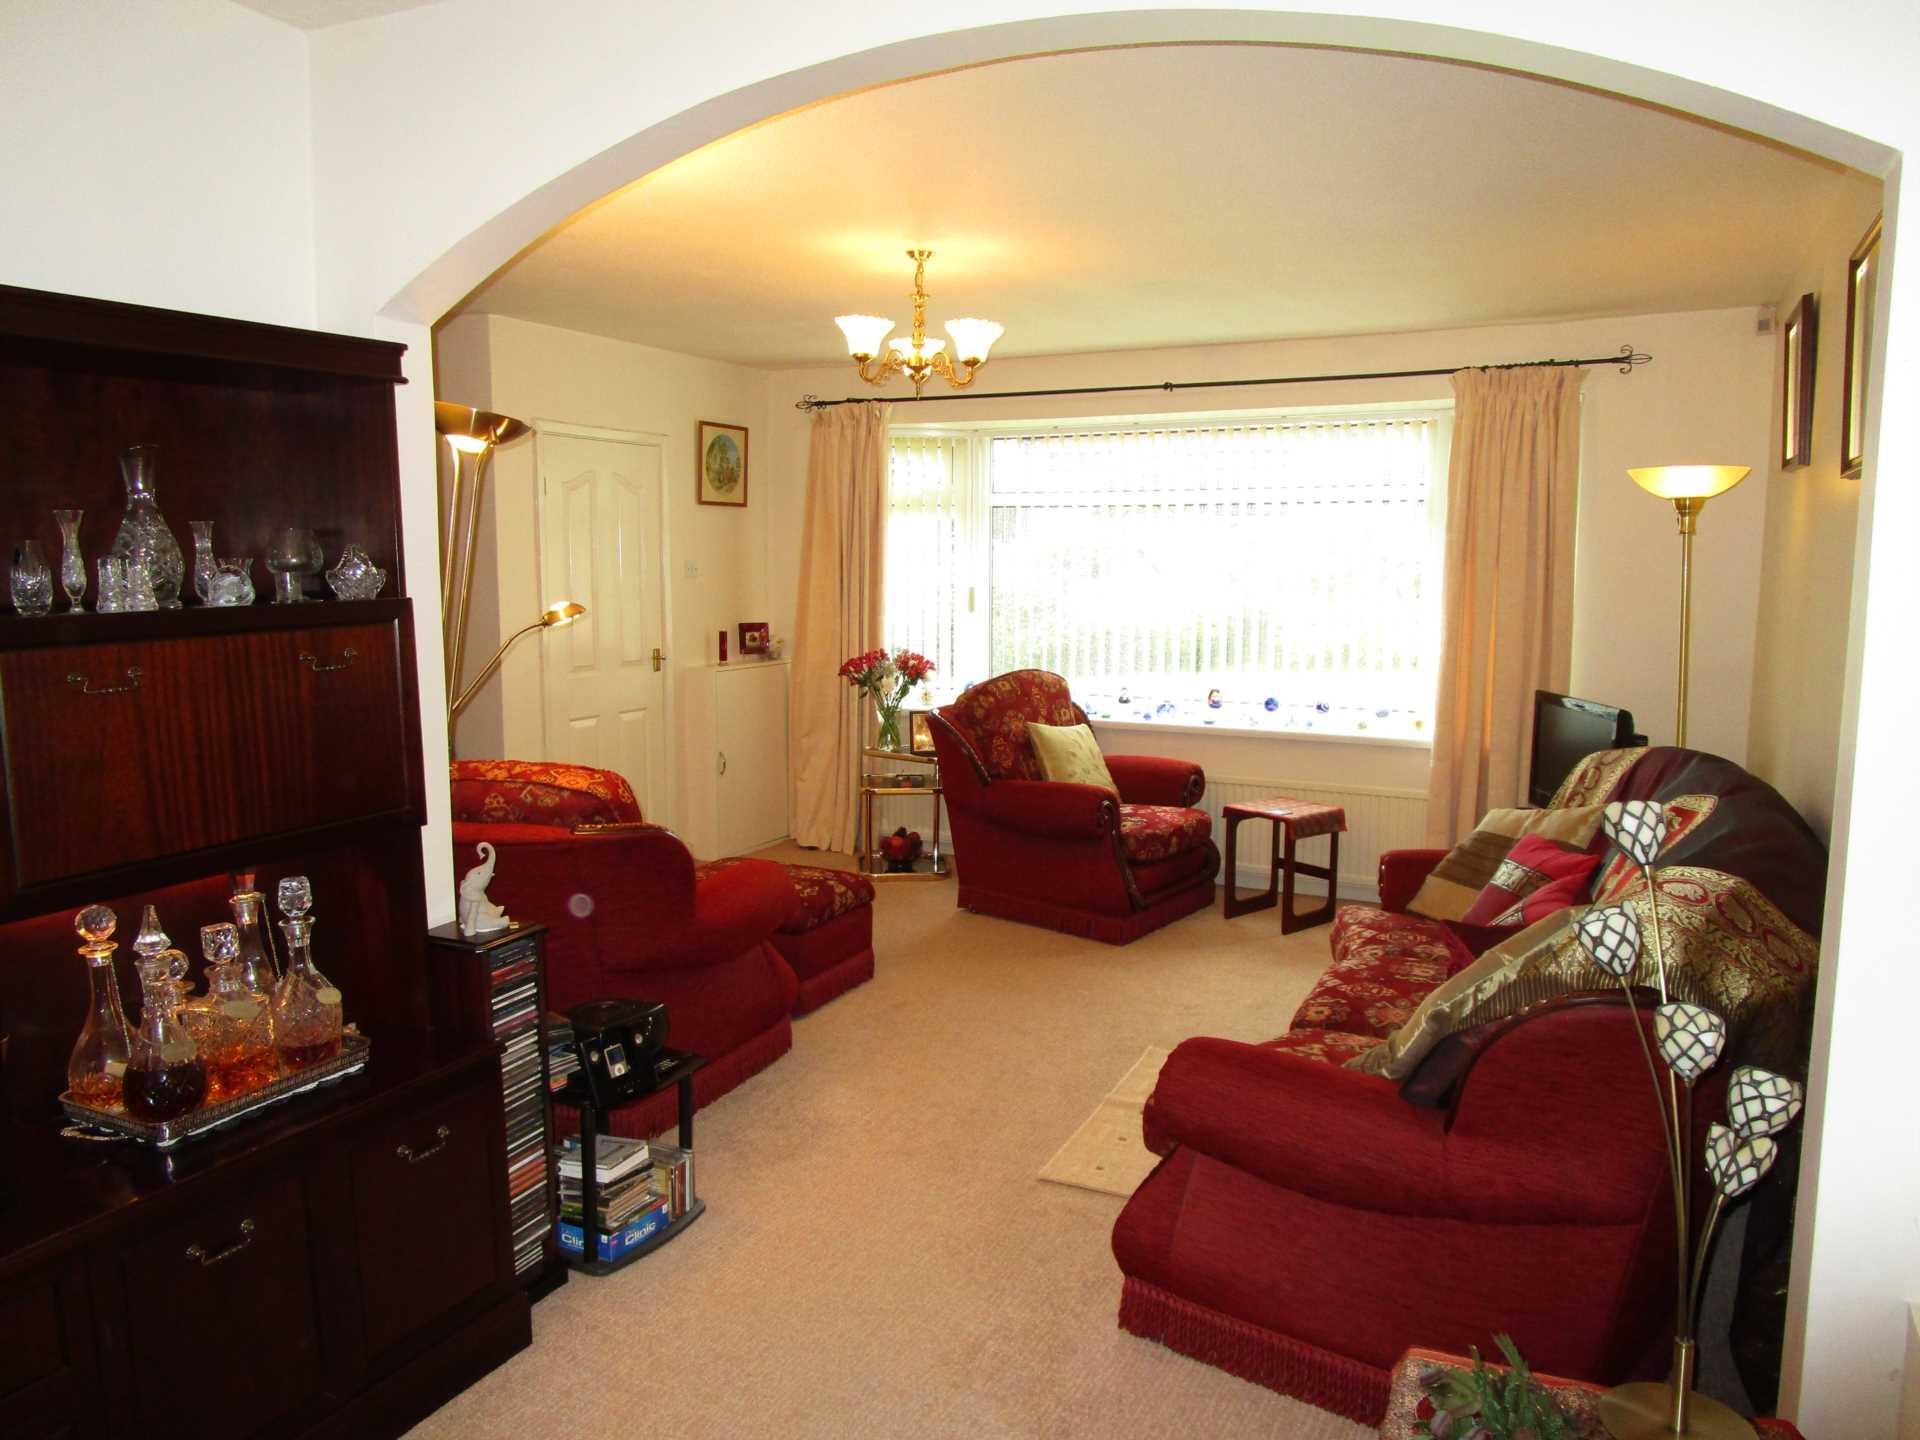 3 Bedroom Bungalow For Sale Dorset Avenue Oldham OL2 7DS